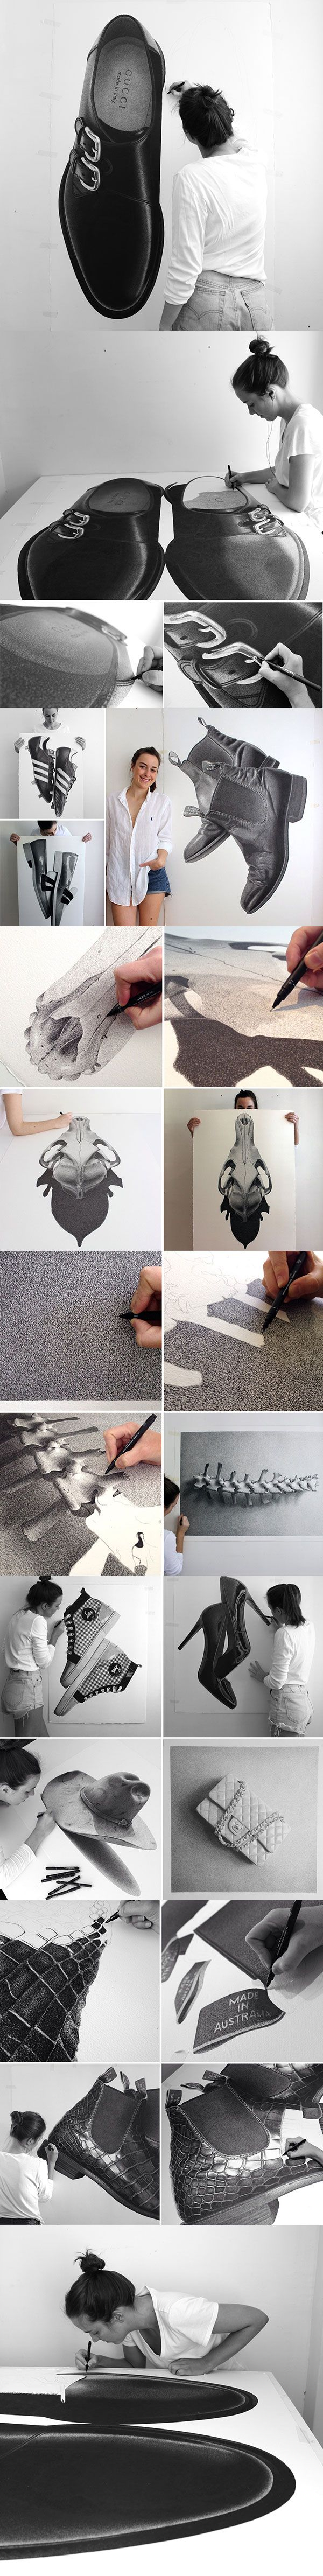 Realistic Drawings B&W   cjhendry